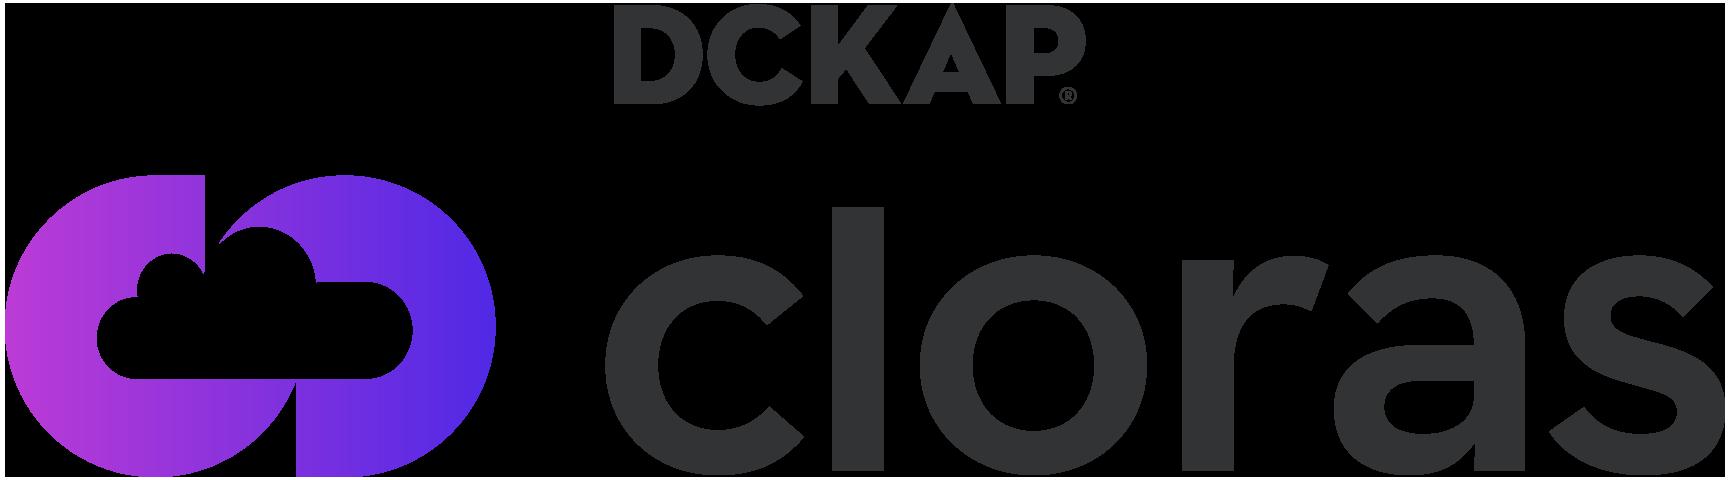 CLORAS - Integration Platform as a Service - DCKAP